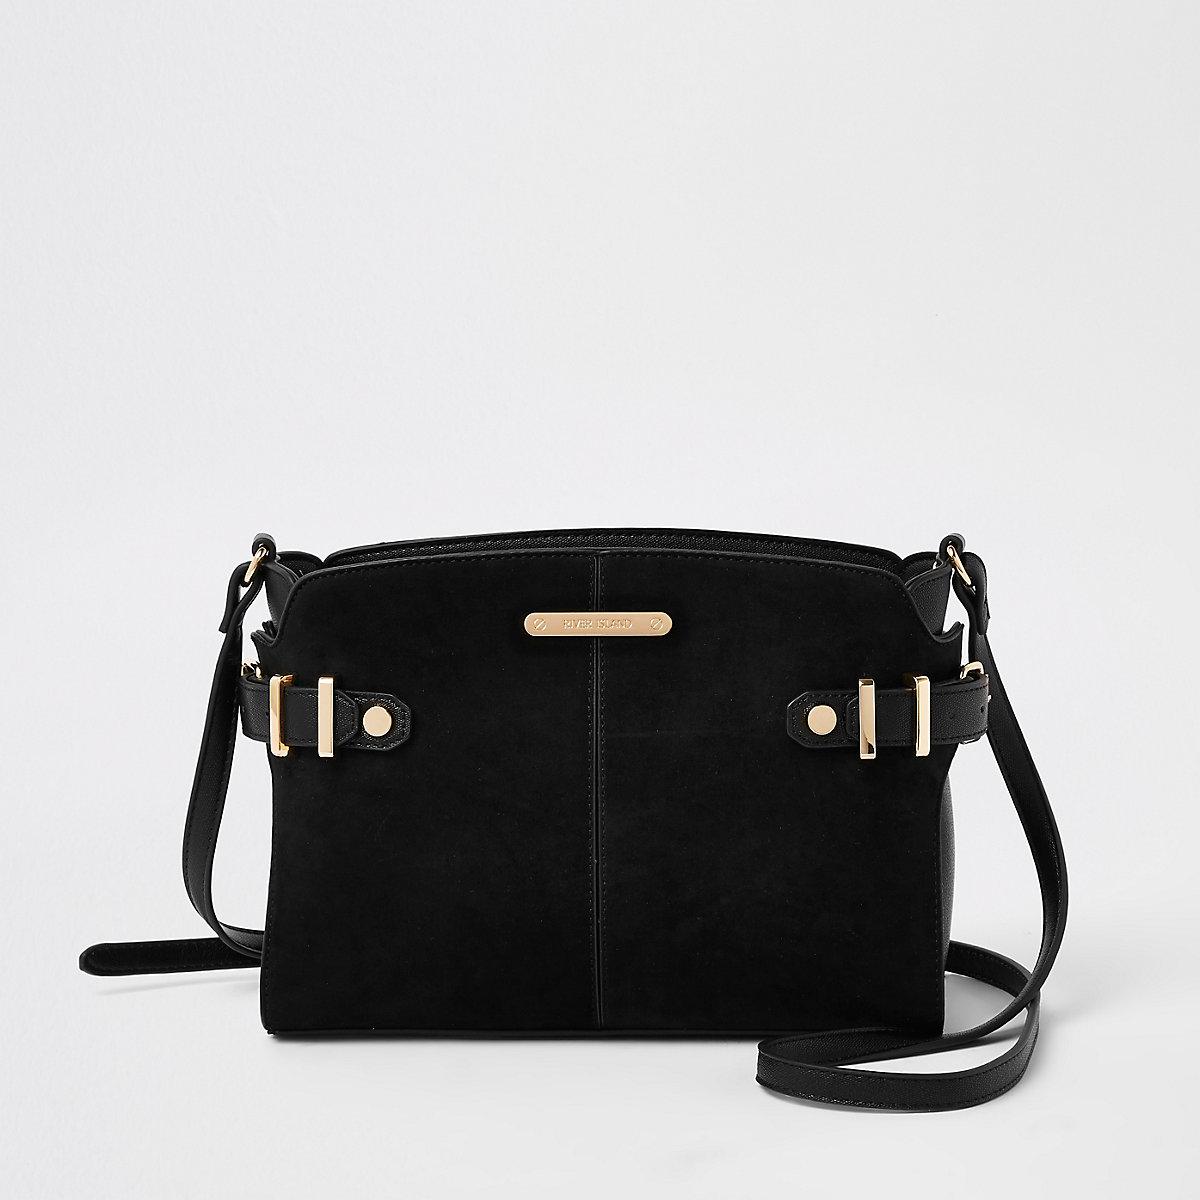 Black tab side cross body bag - Cross Body Bags - Bags   Purses - women 8ad3182cecb60